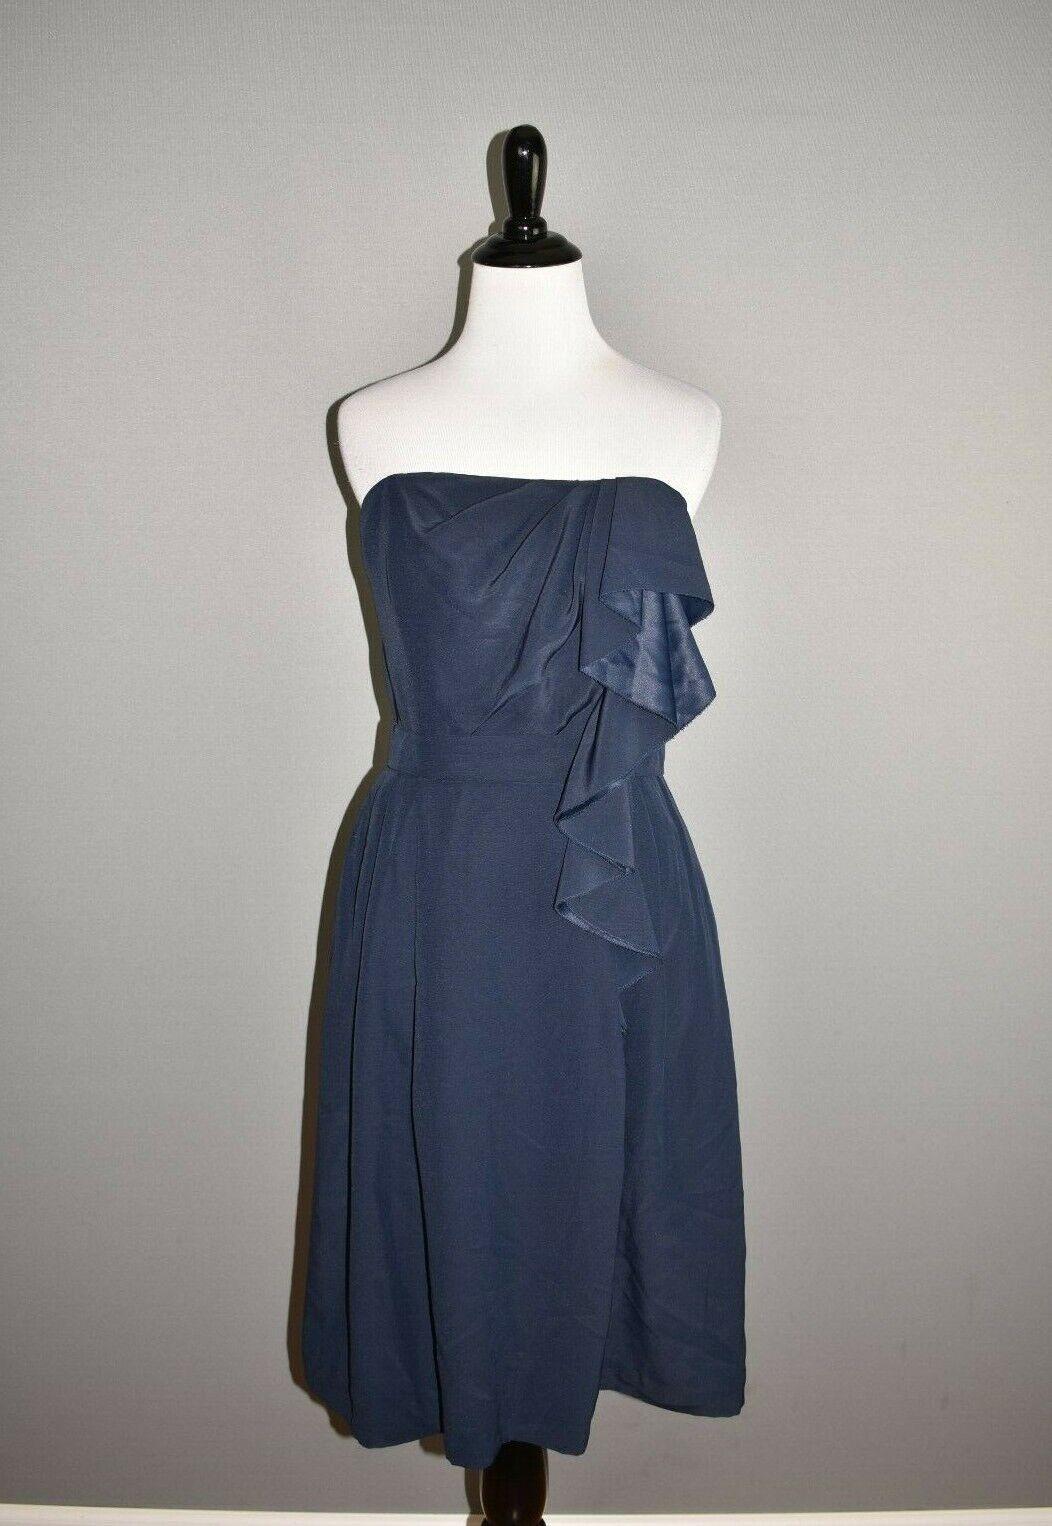 LELA ROSE NEW Midnight Navy Strapless Bridesmaid Dress Size 8